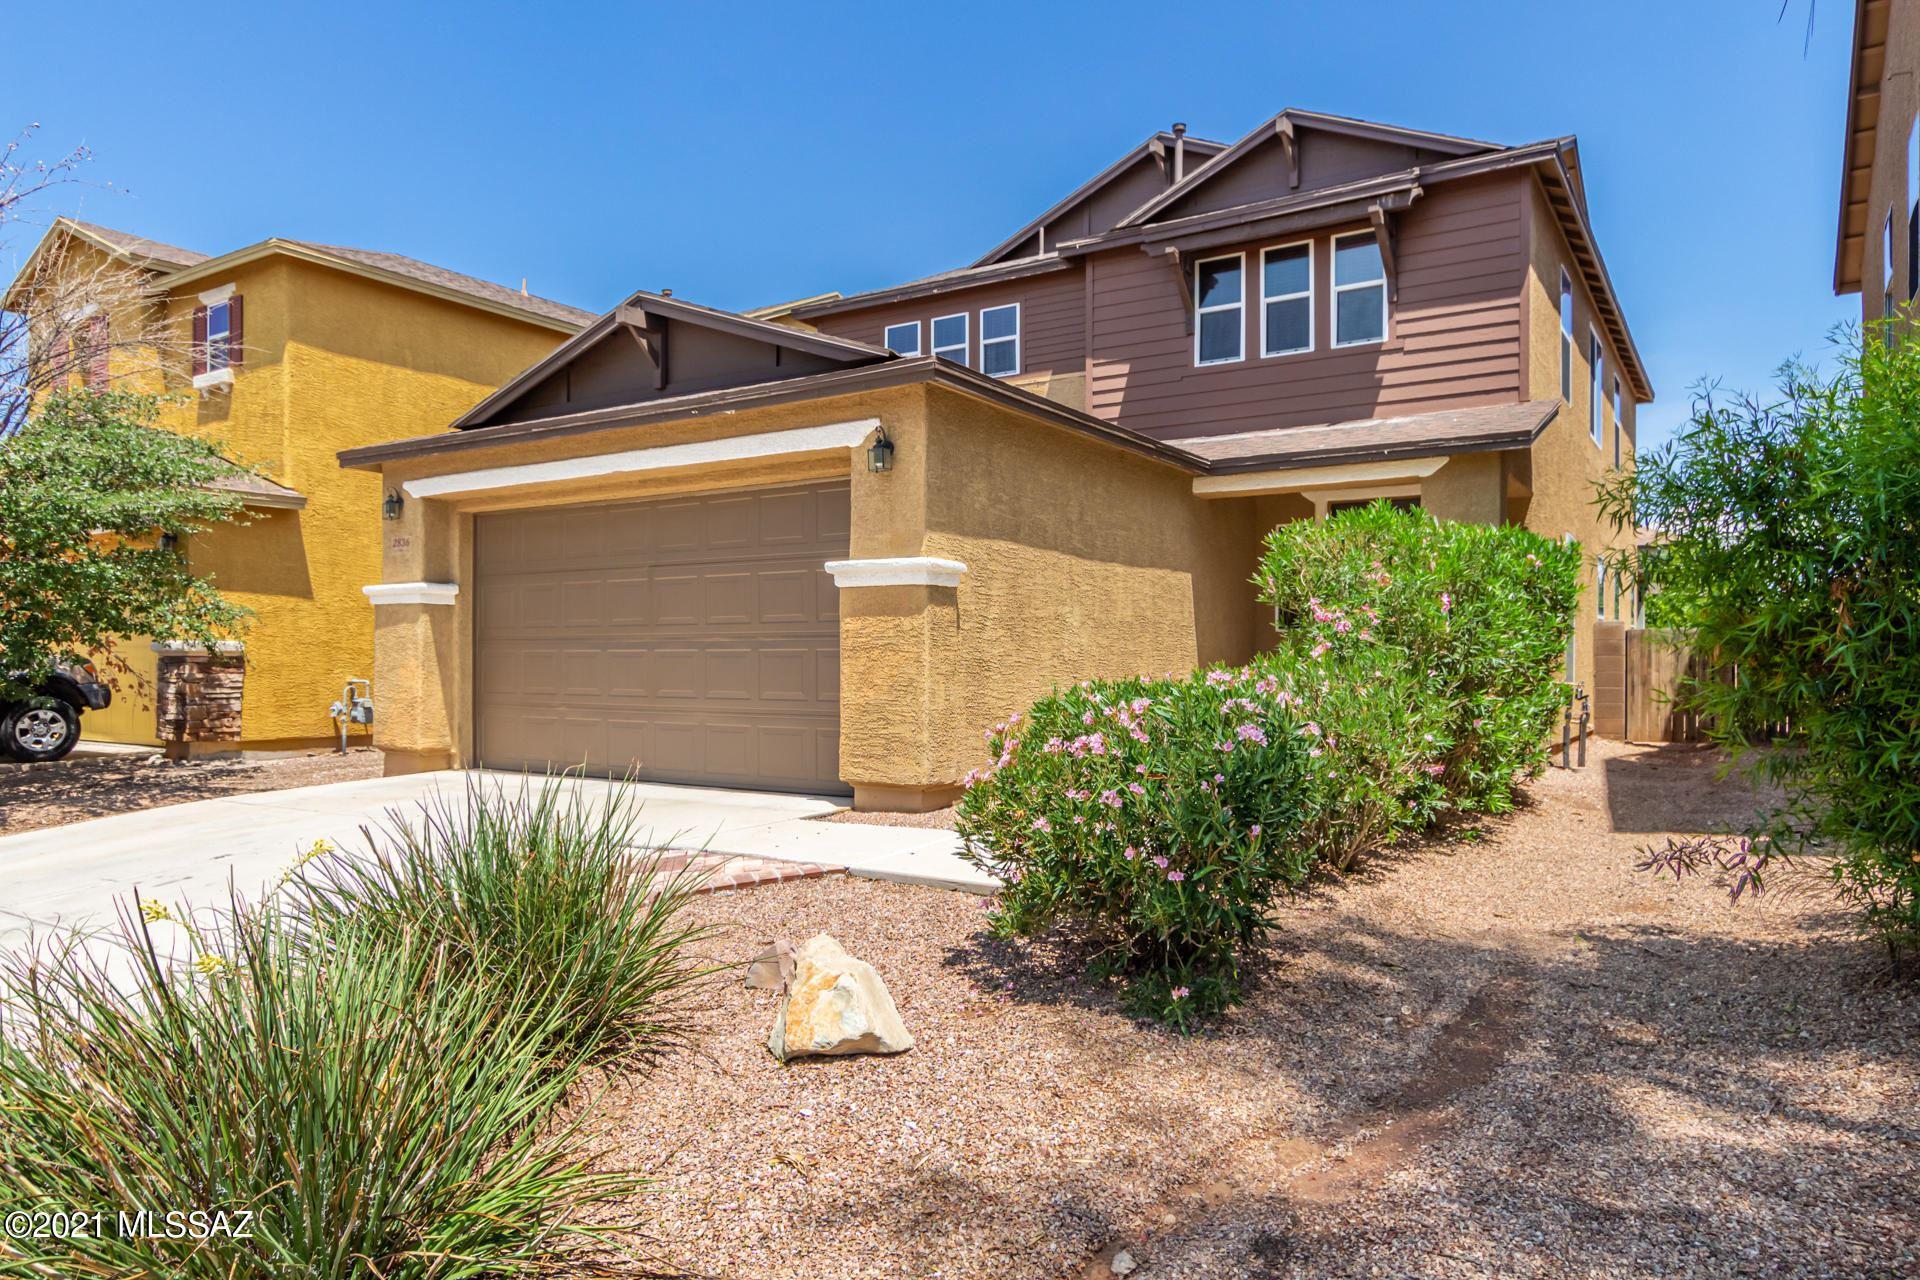 2836 W Greenstreak Drive, Tucson, AZ 85741 - #: 22117773